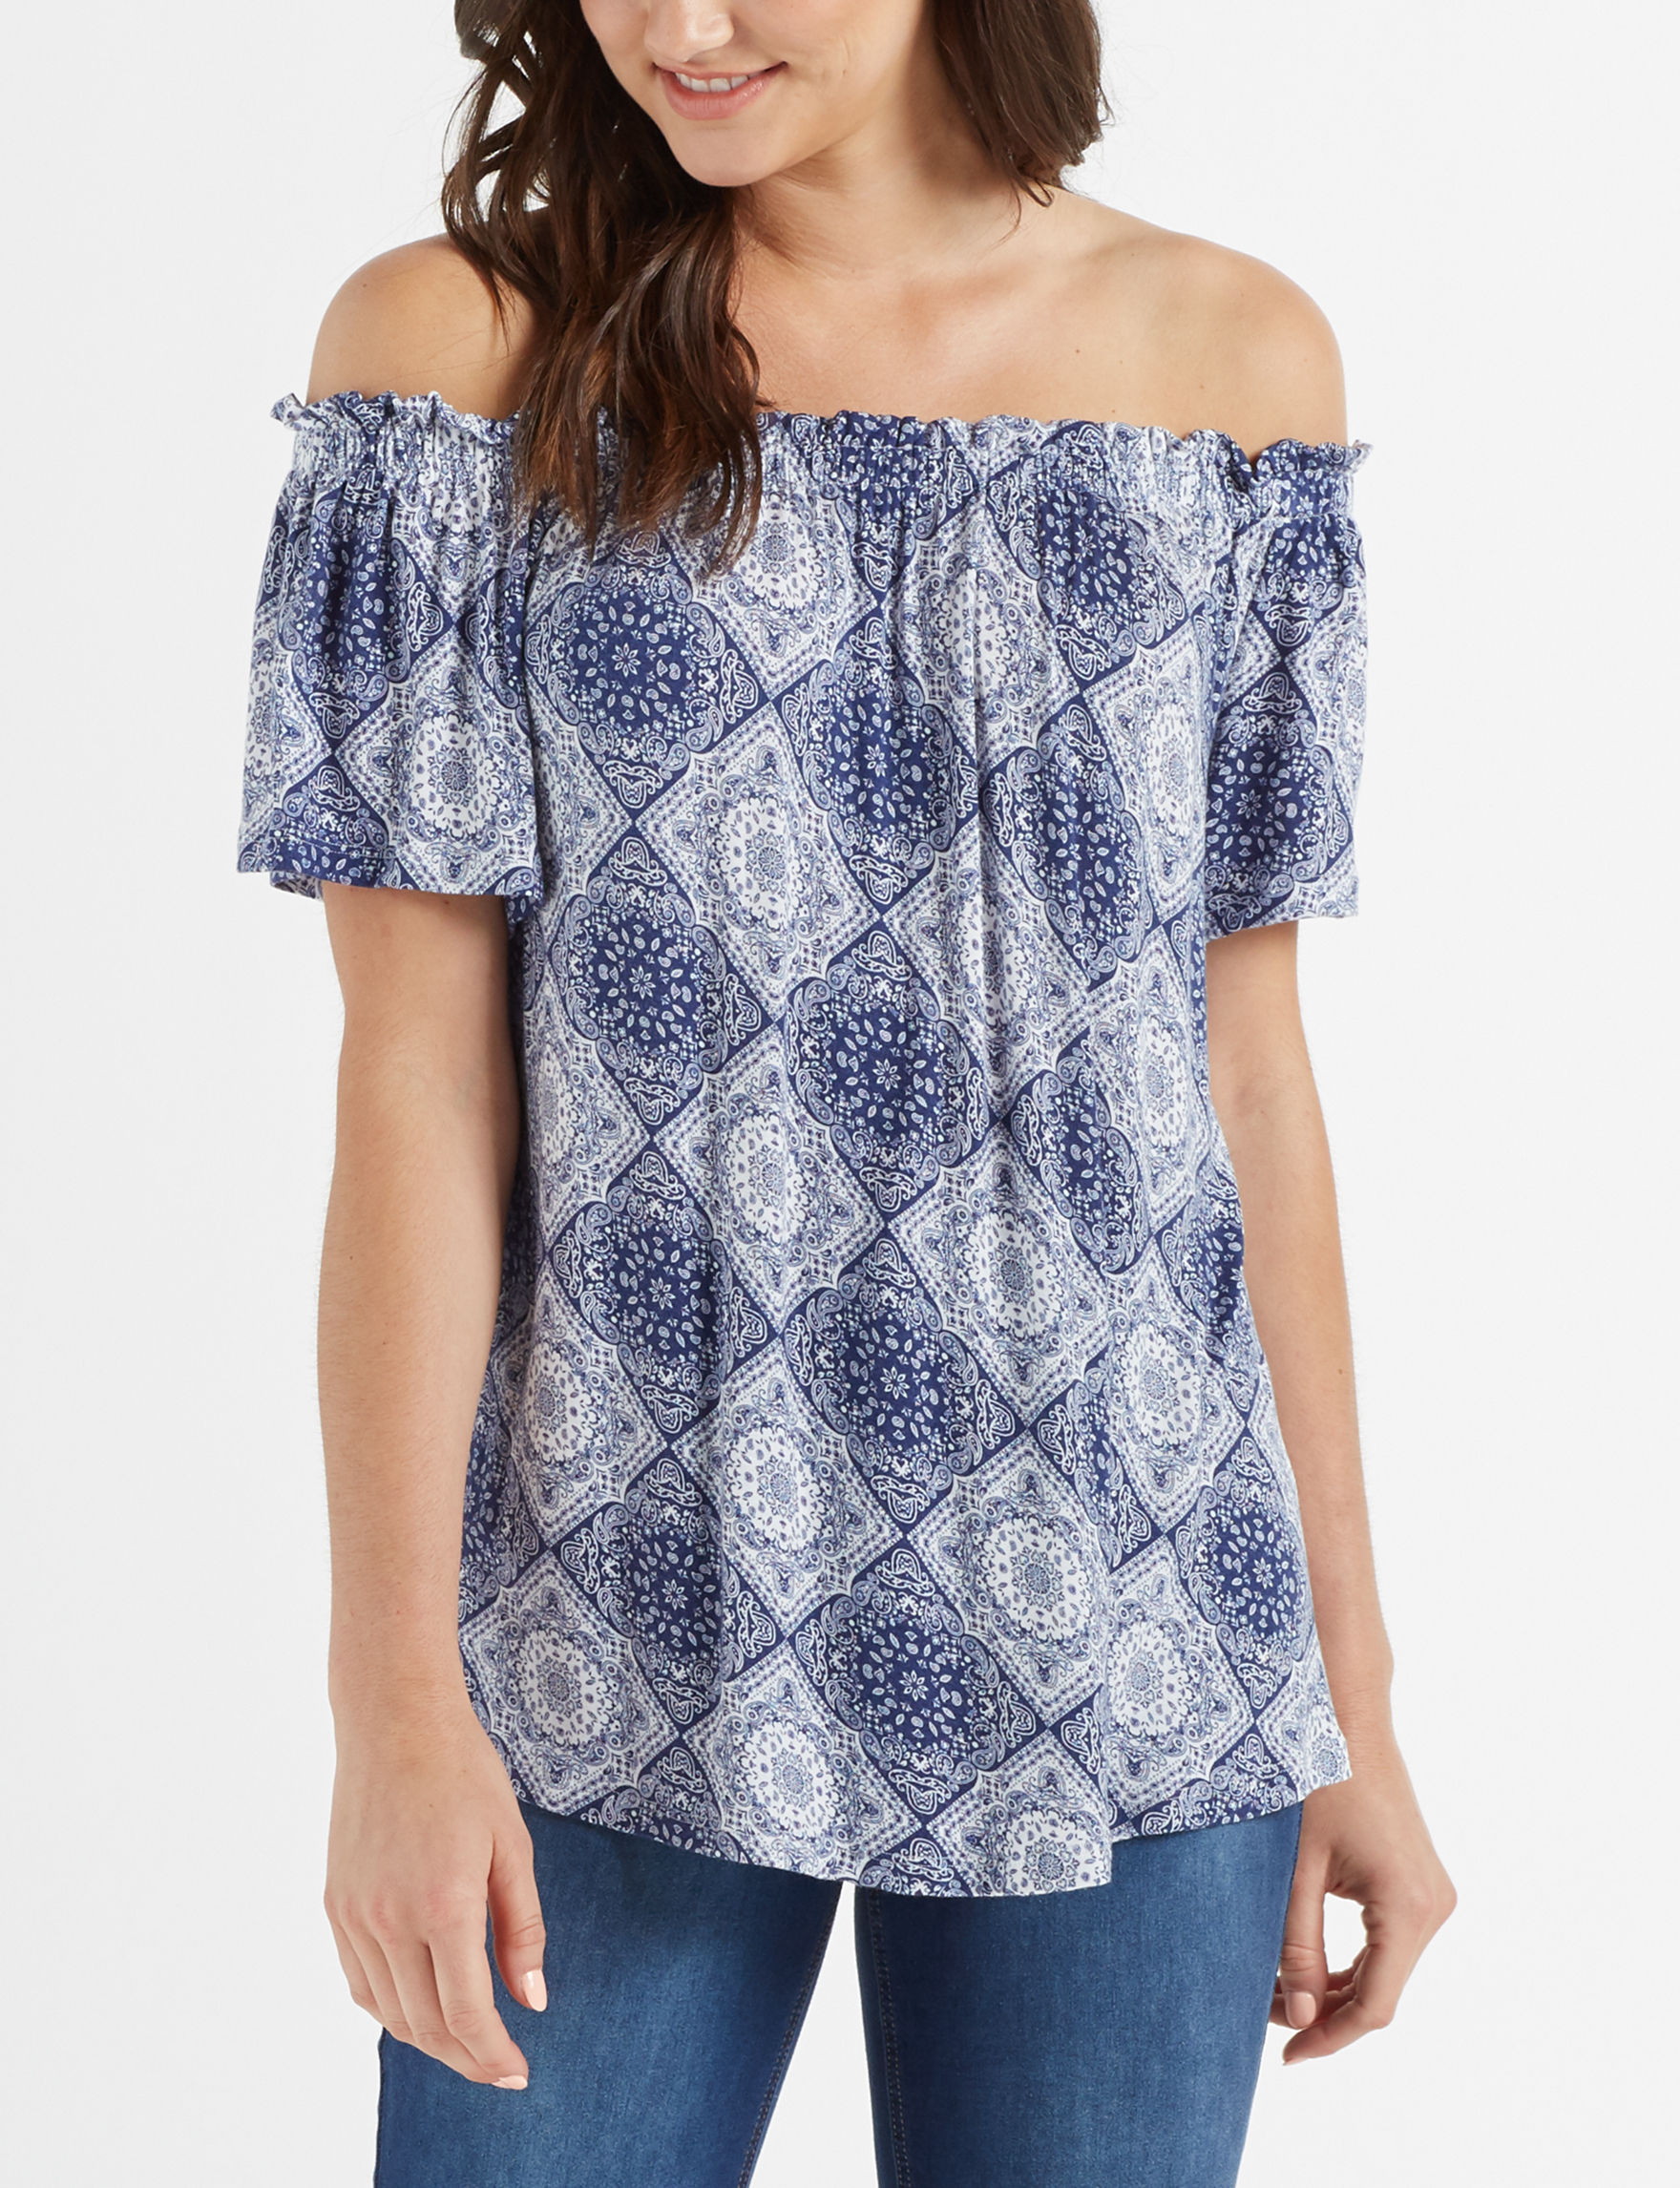 Wishful Park Blue Shirts & Blouses